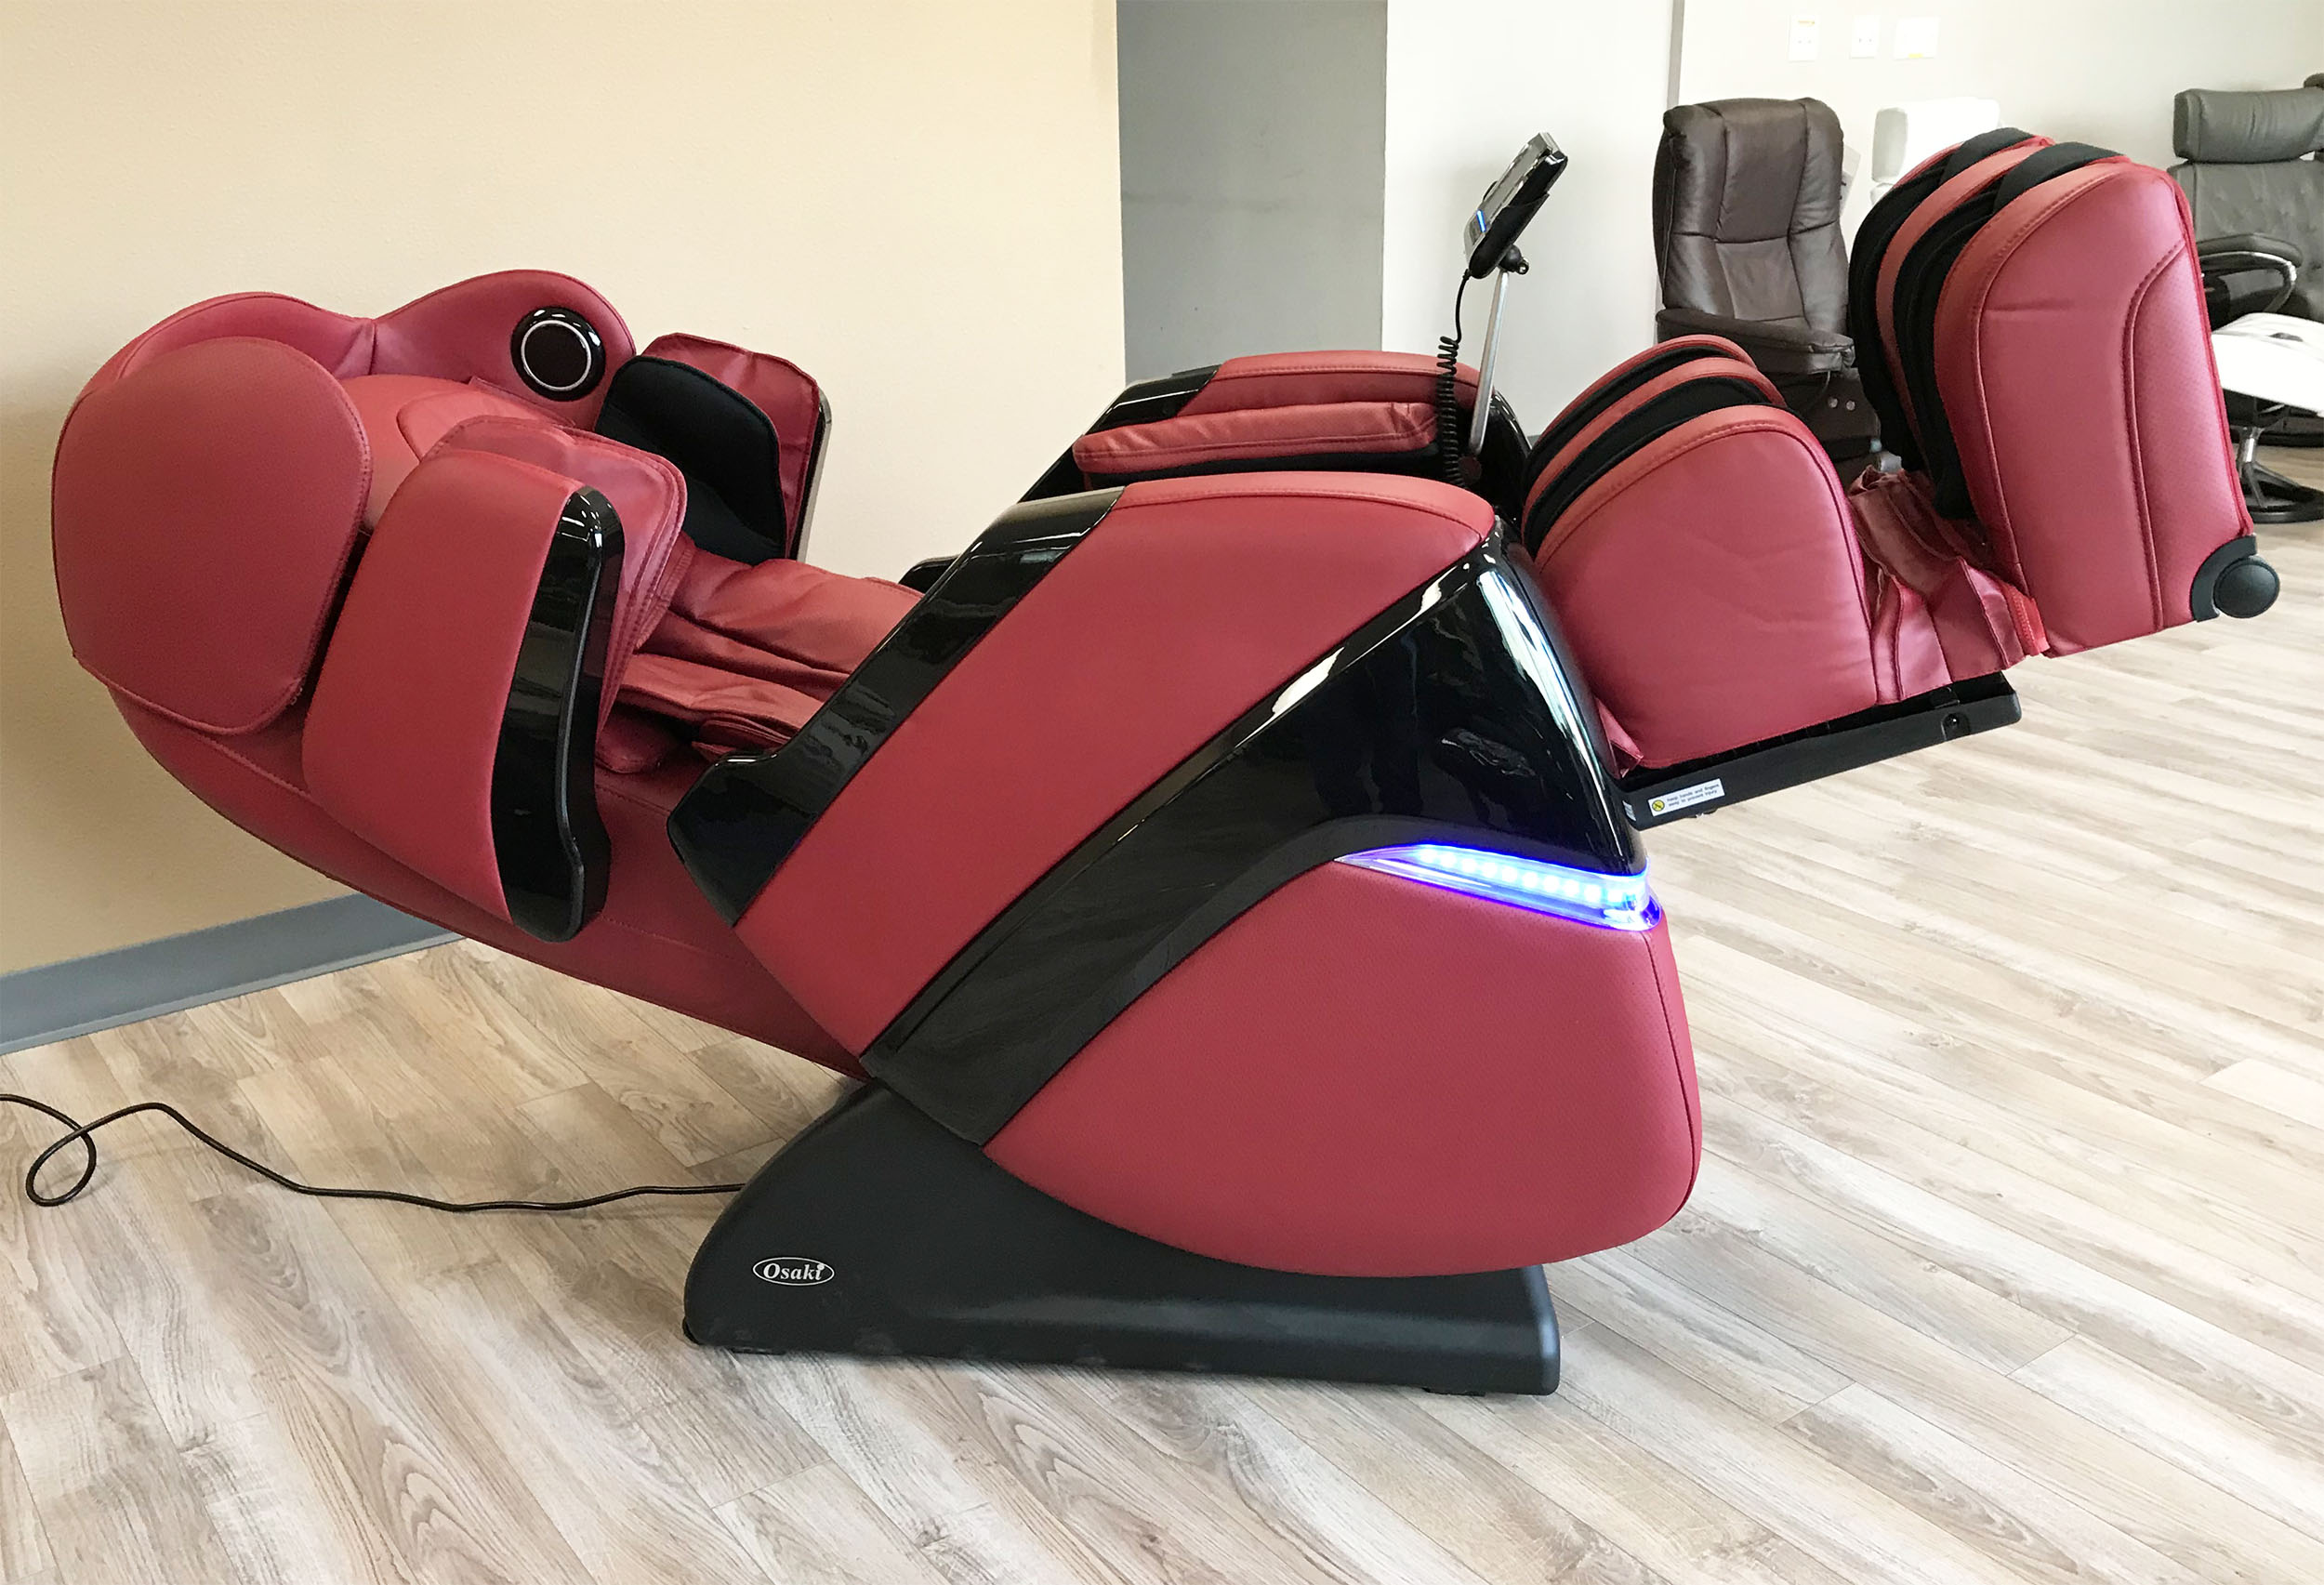 osaki os 3d pro cyber massage chair swing range zero gravity recliner and